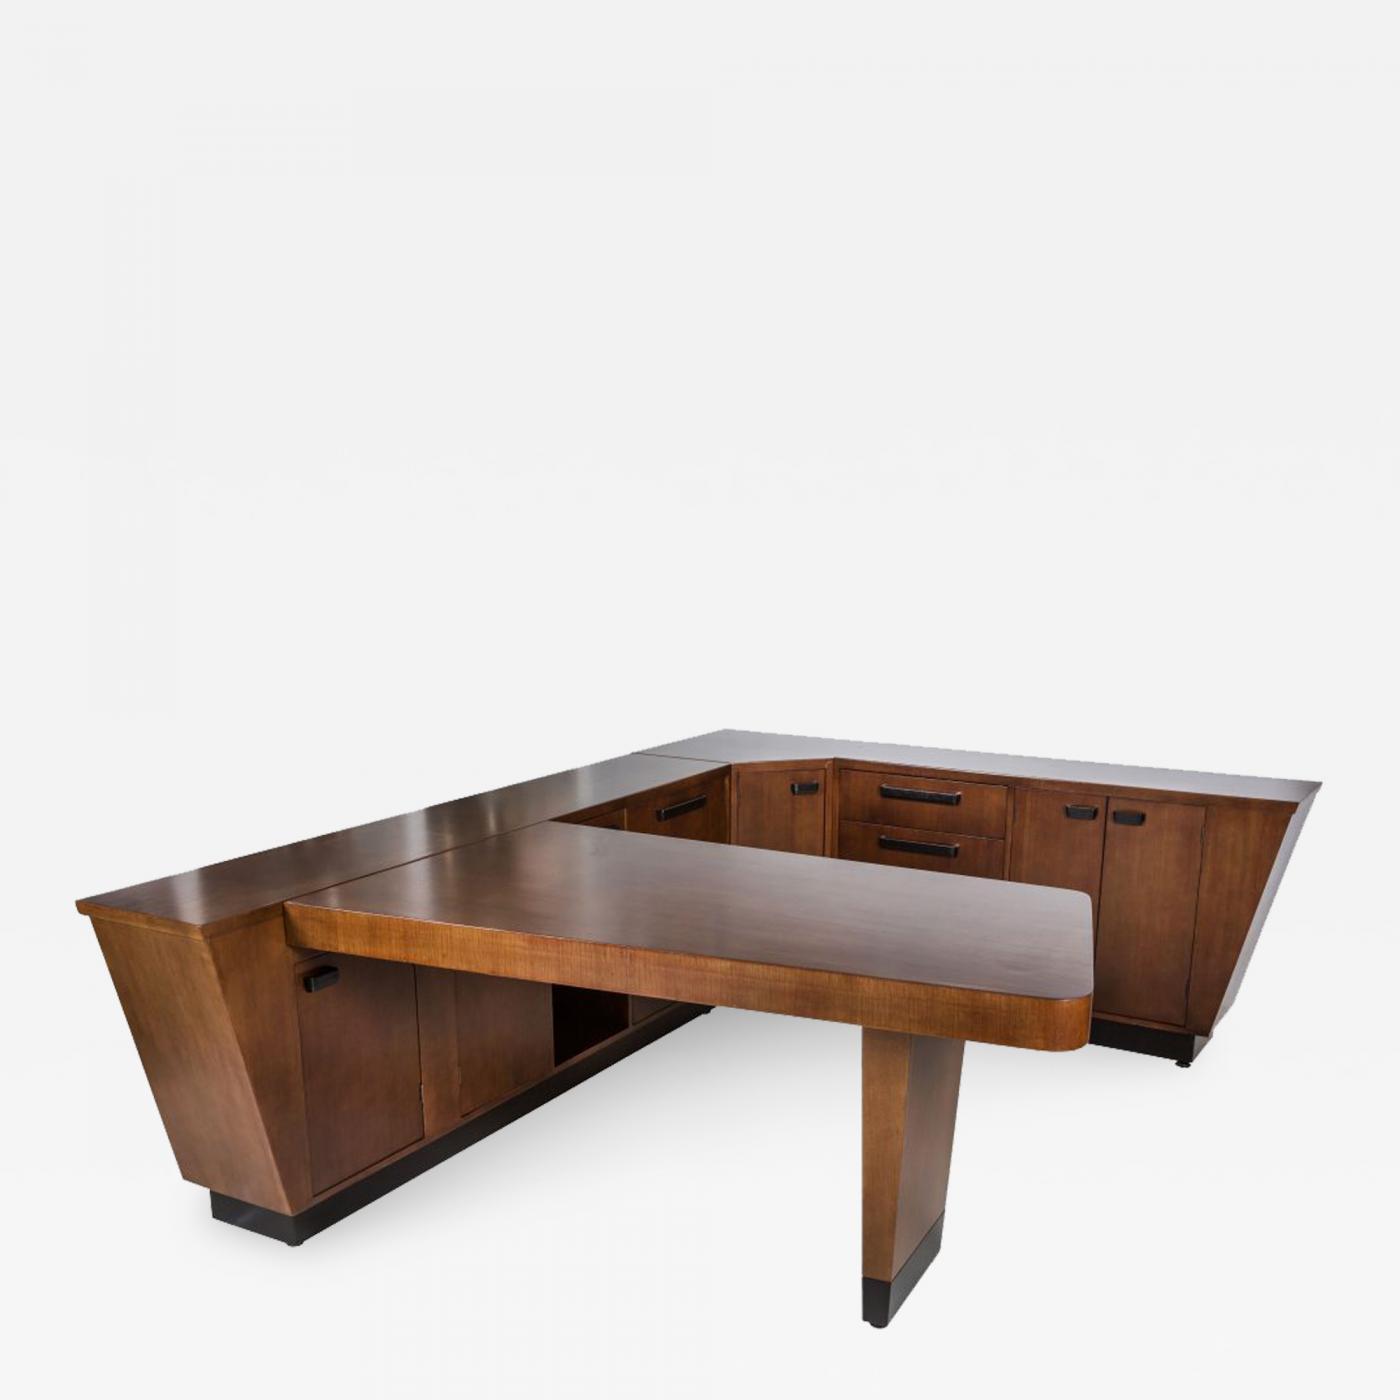 streamline wraparound desk and console rh incollect com wrap around office desk wrap around desk with hutch